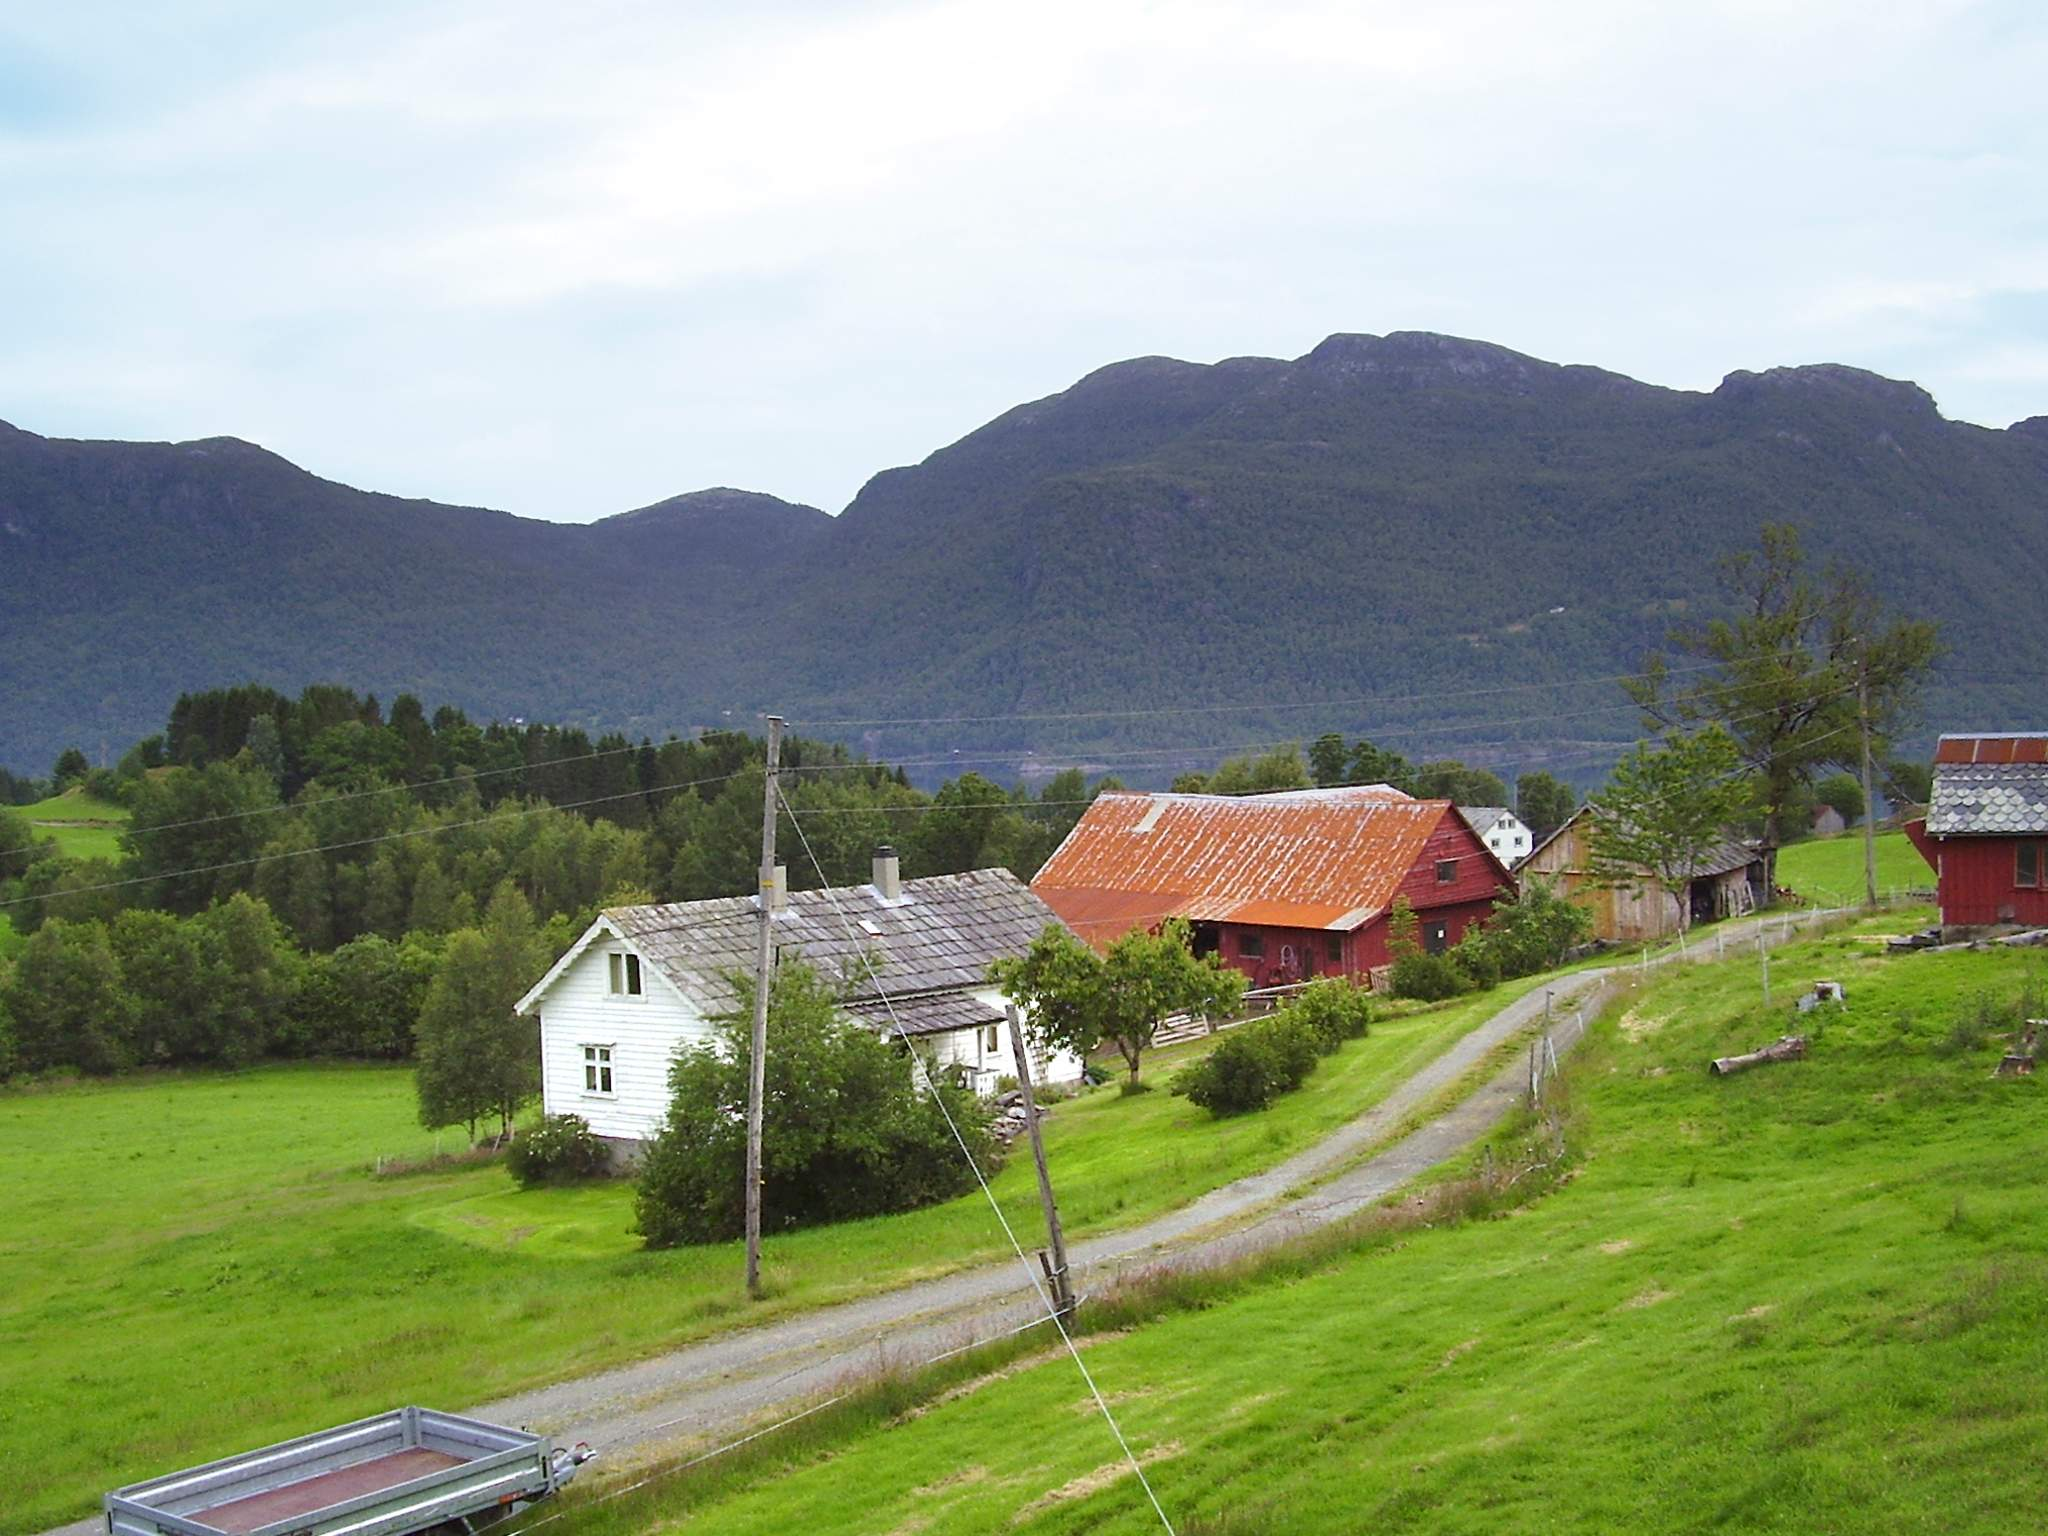 Ferienhaus Etne (83639), Etne, Hordaland - Hardangerfjord, Westnorwegen, Norwegen, Bild 18